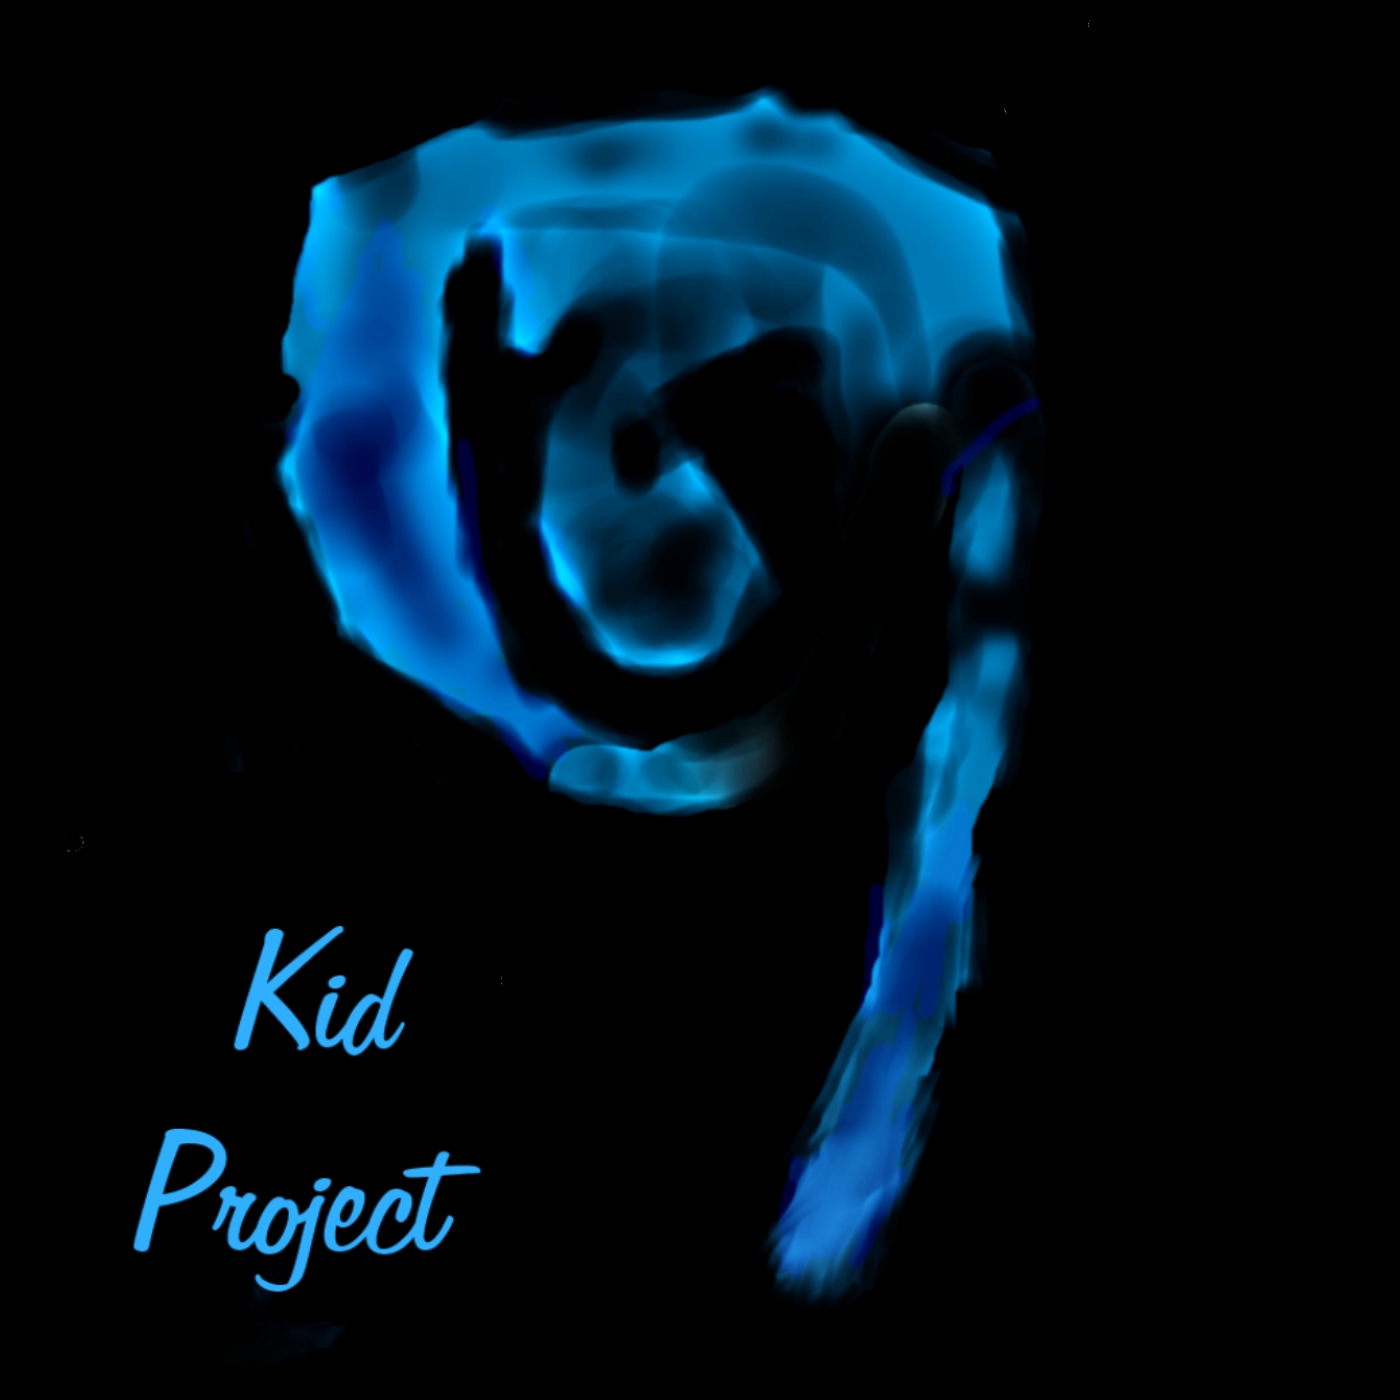 1743246_151124912731_KidProjectEP.jpg